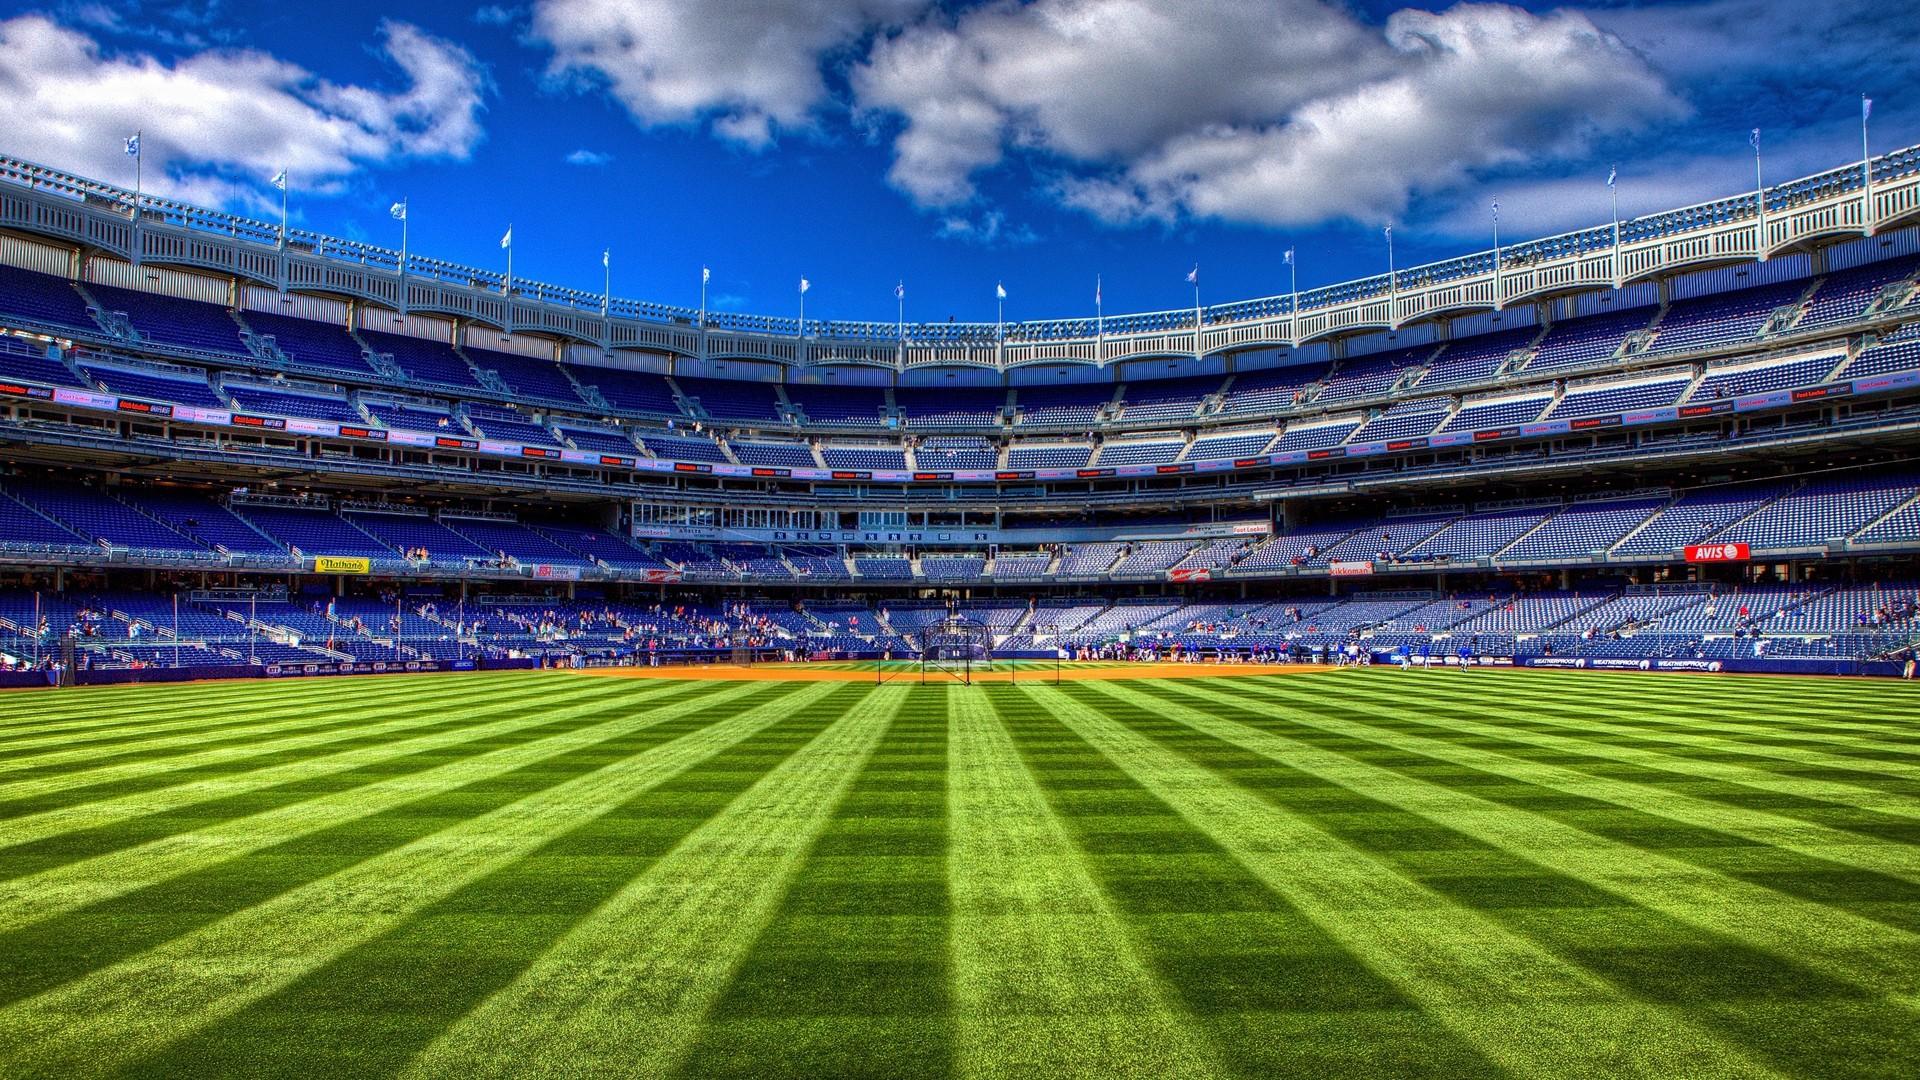 … field · field, football, tribunes